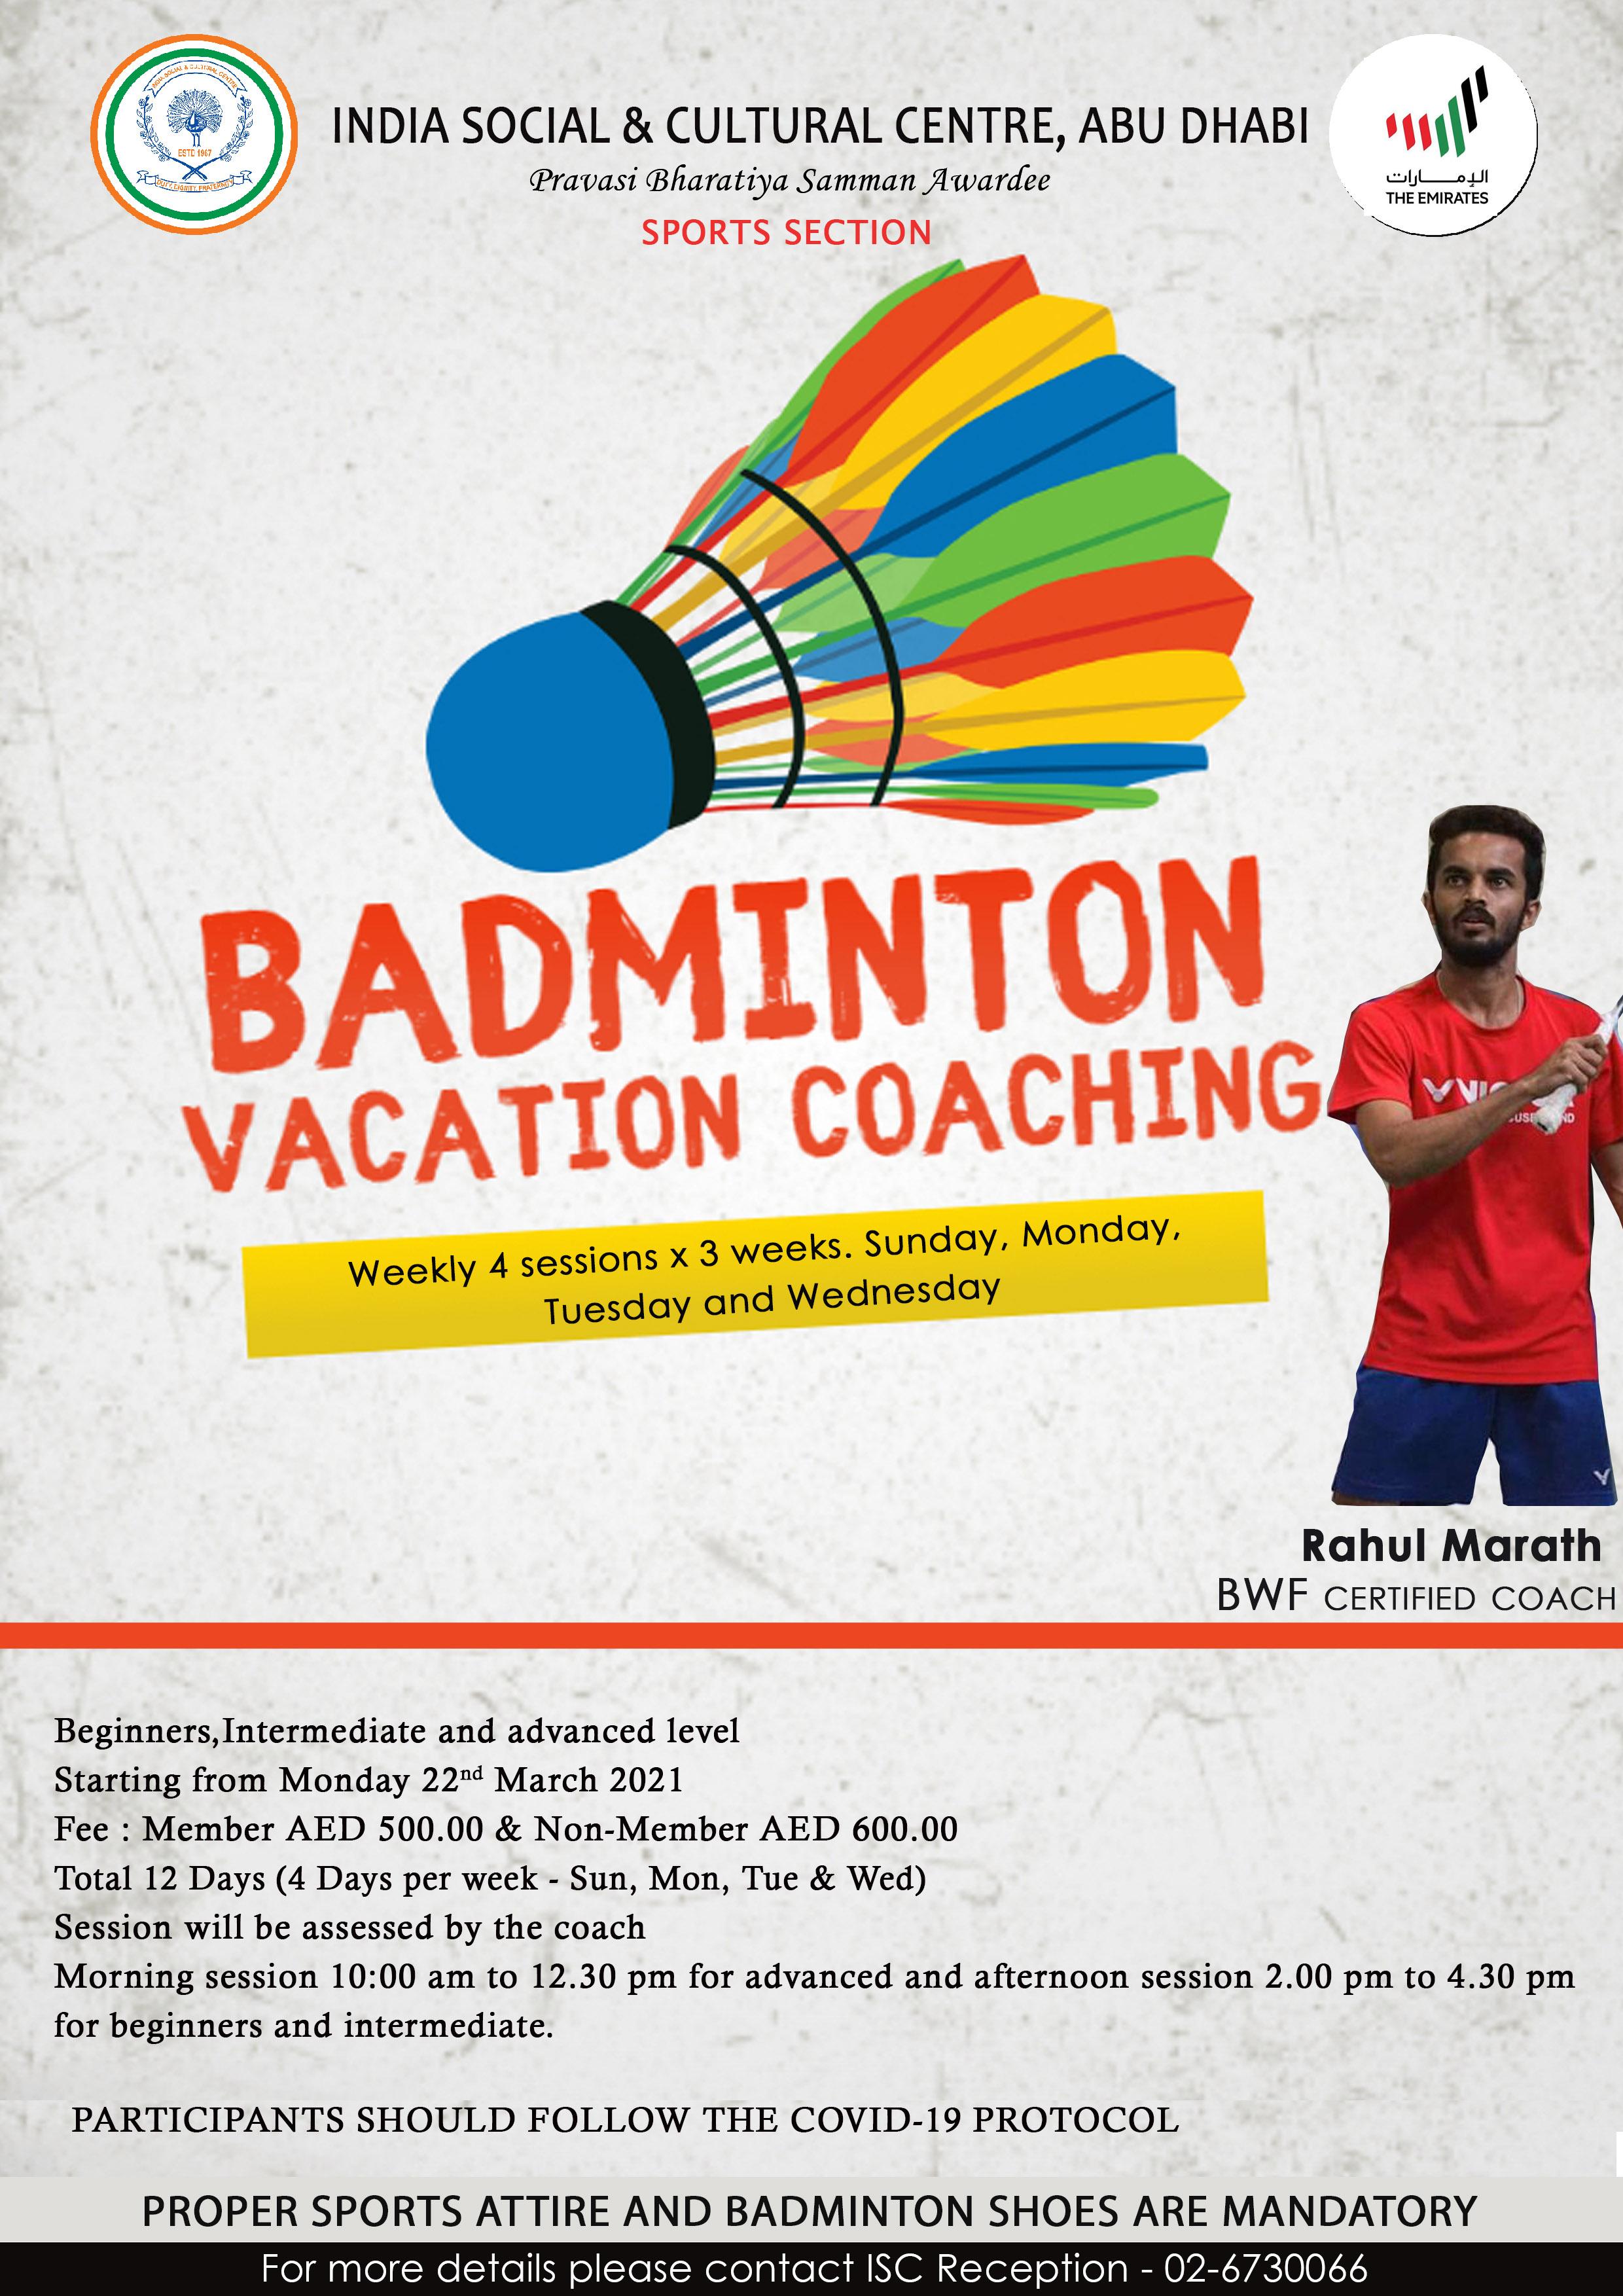 Badminton-Vacation-Coaching_1616221988